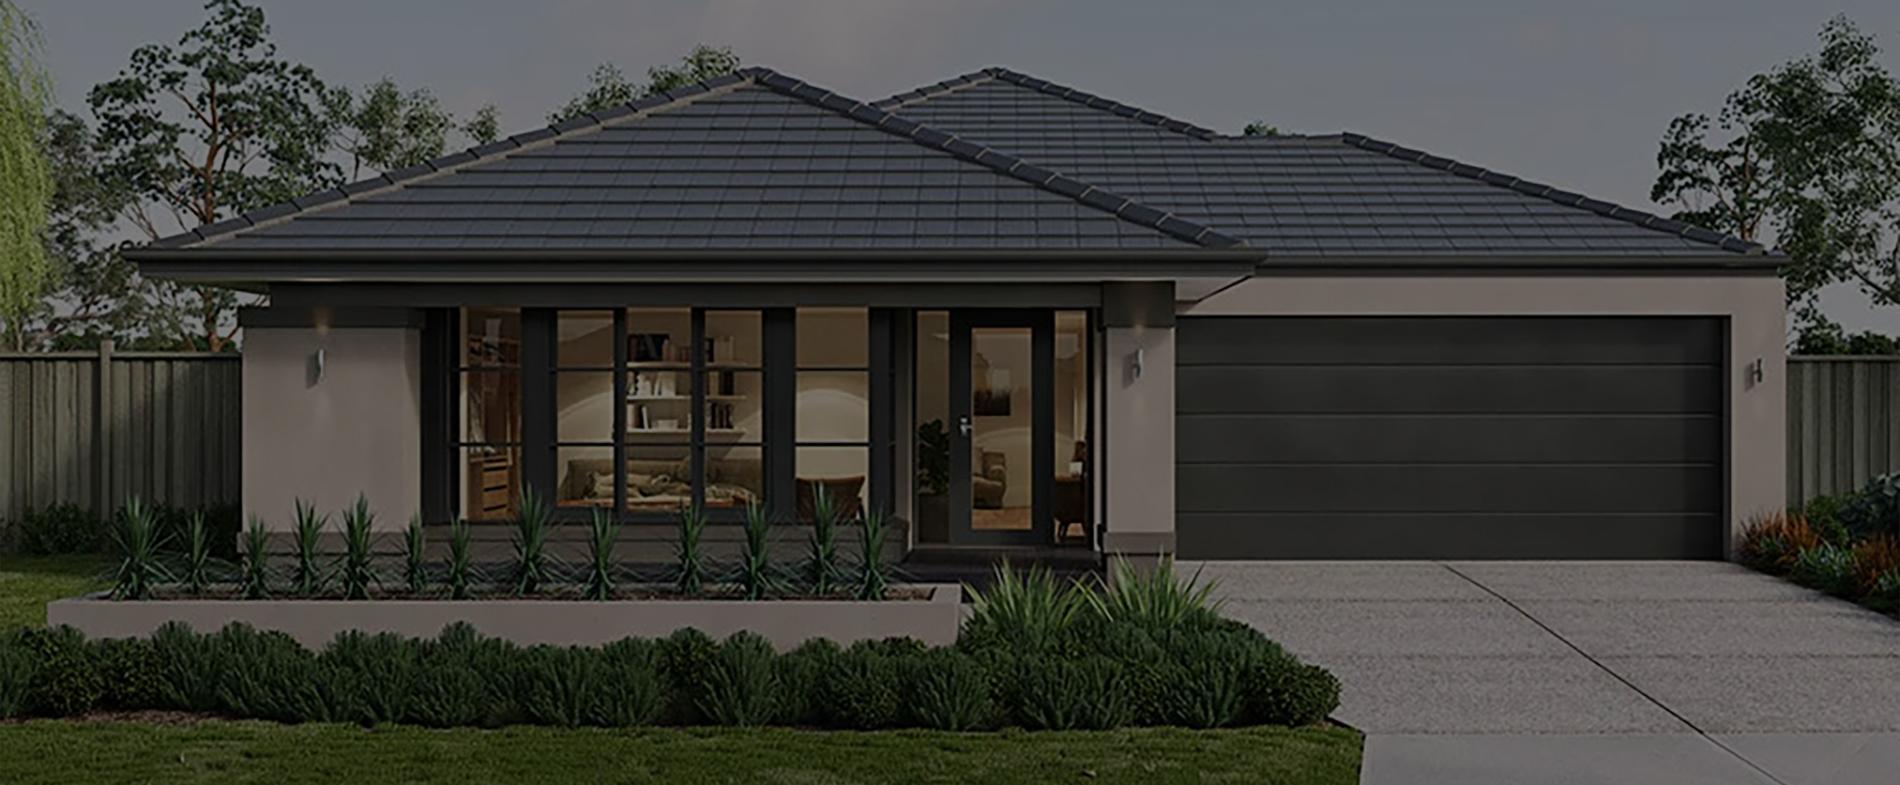 Secure-Housing-Australia-Home.jpg